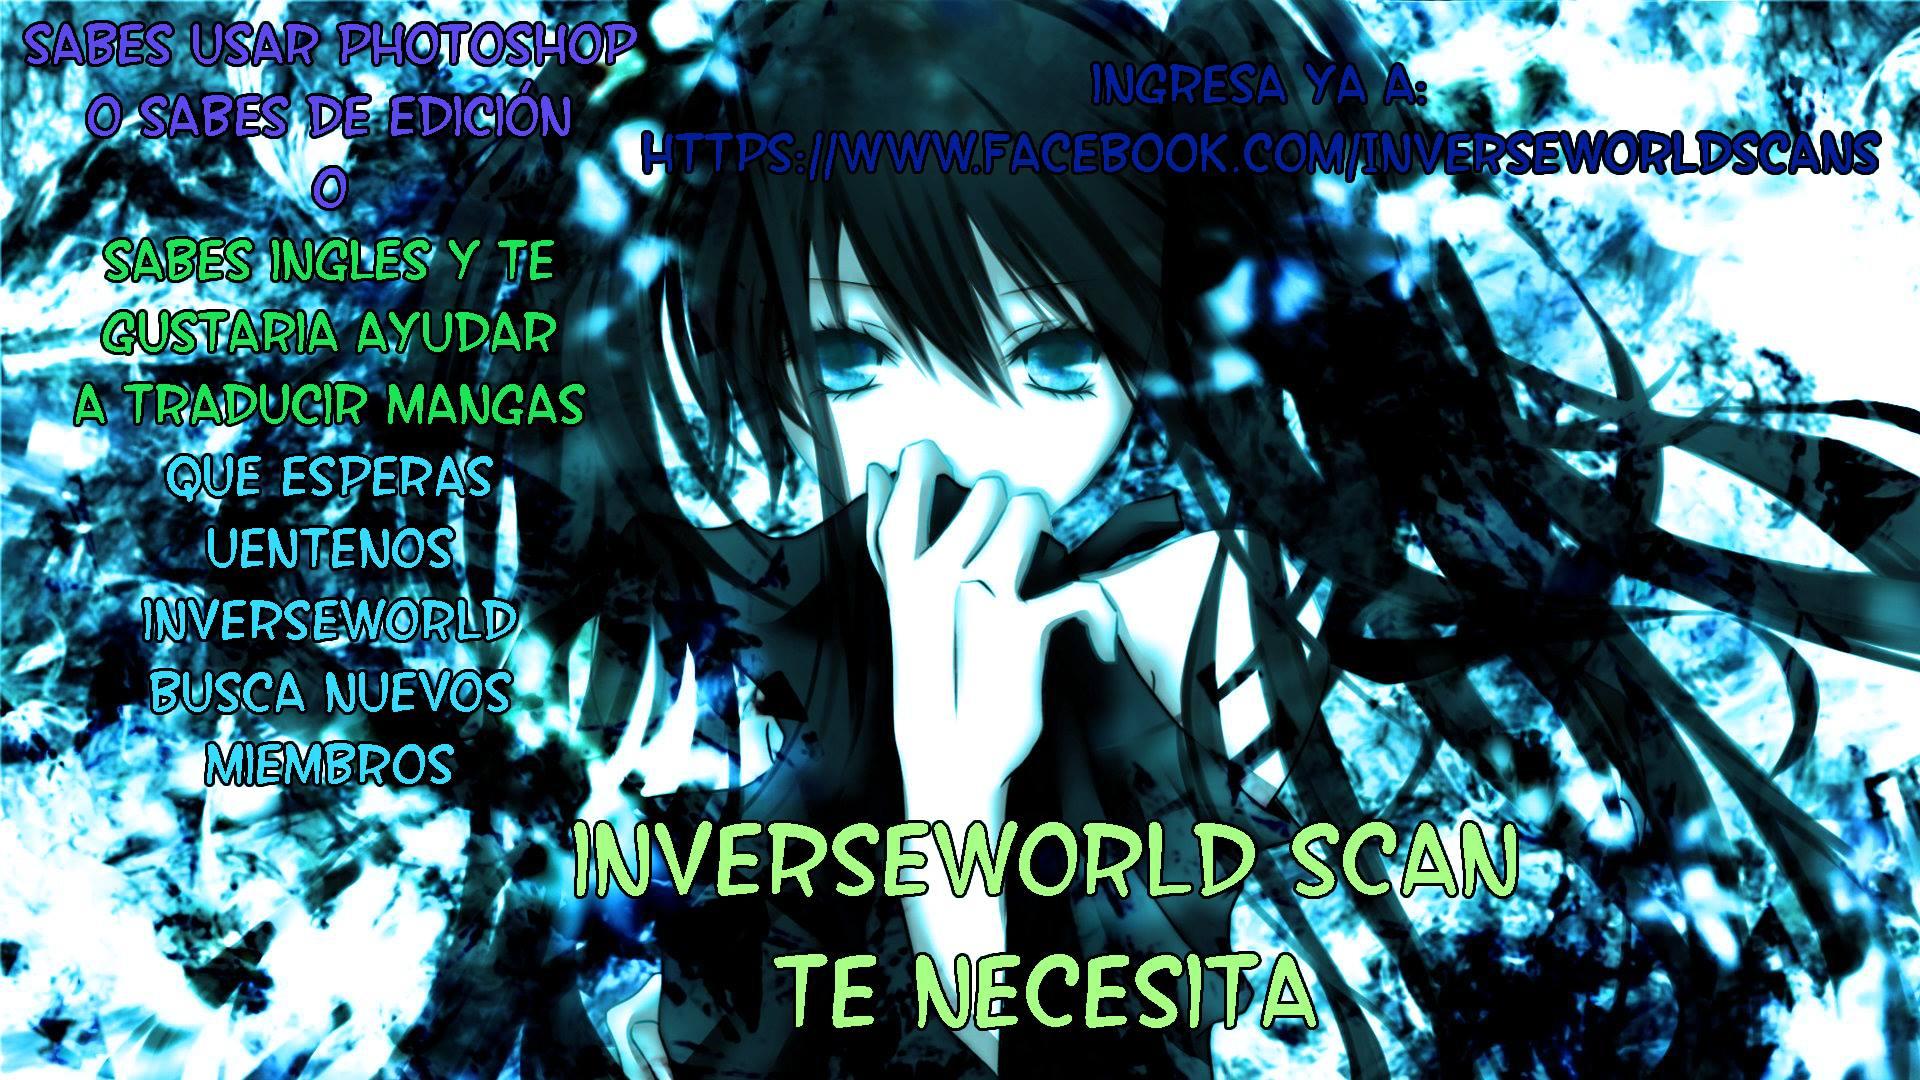 https://c5.mangatag.com/es_manga/18/16210/415315/bd5af7cd922fd2603be4ee3dc43b0b77.jpg Page 2